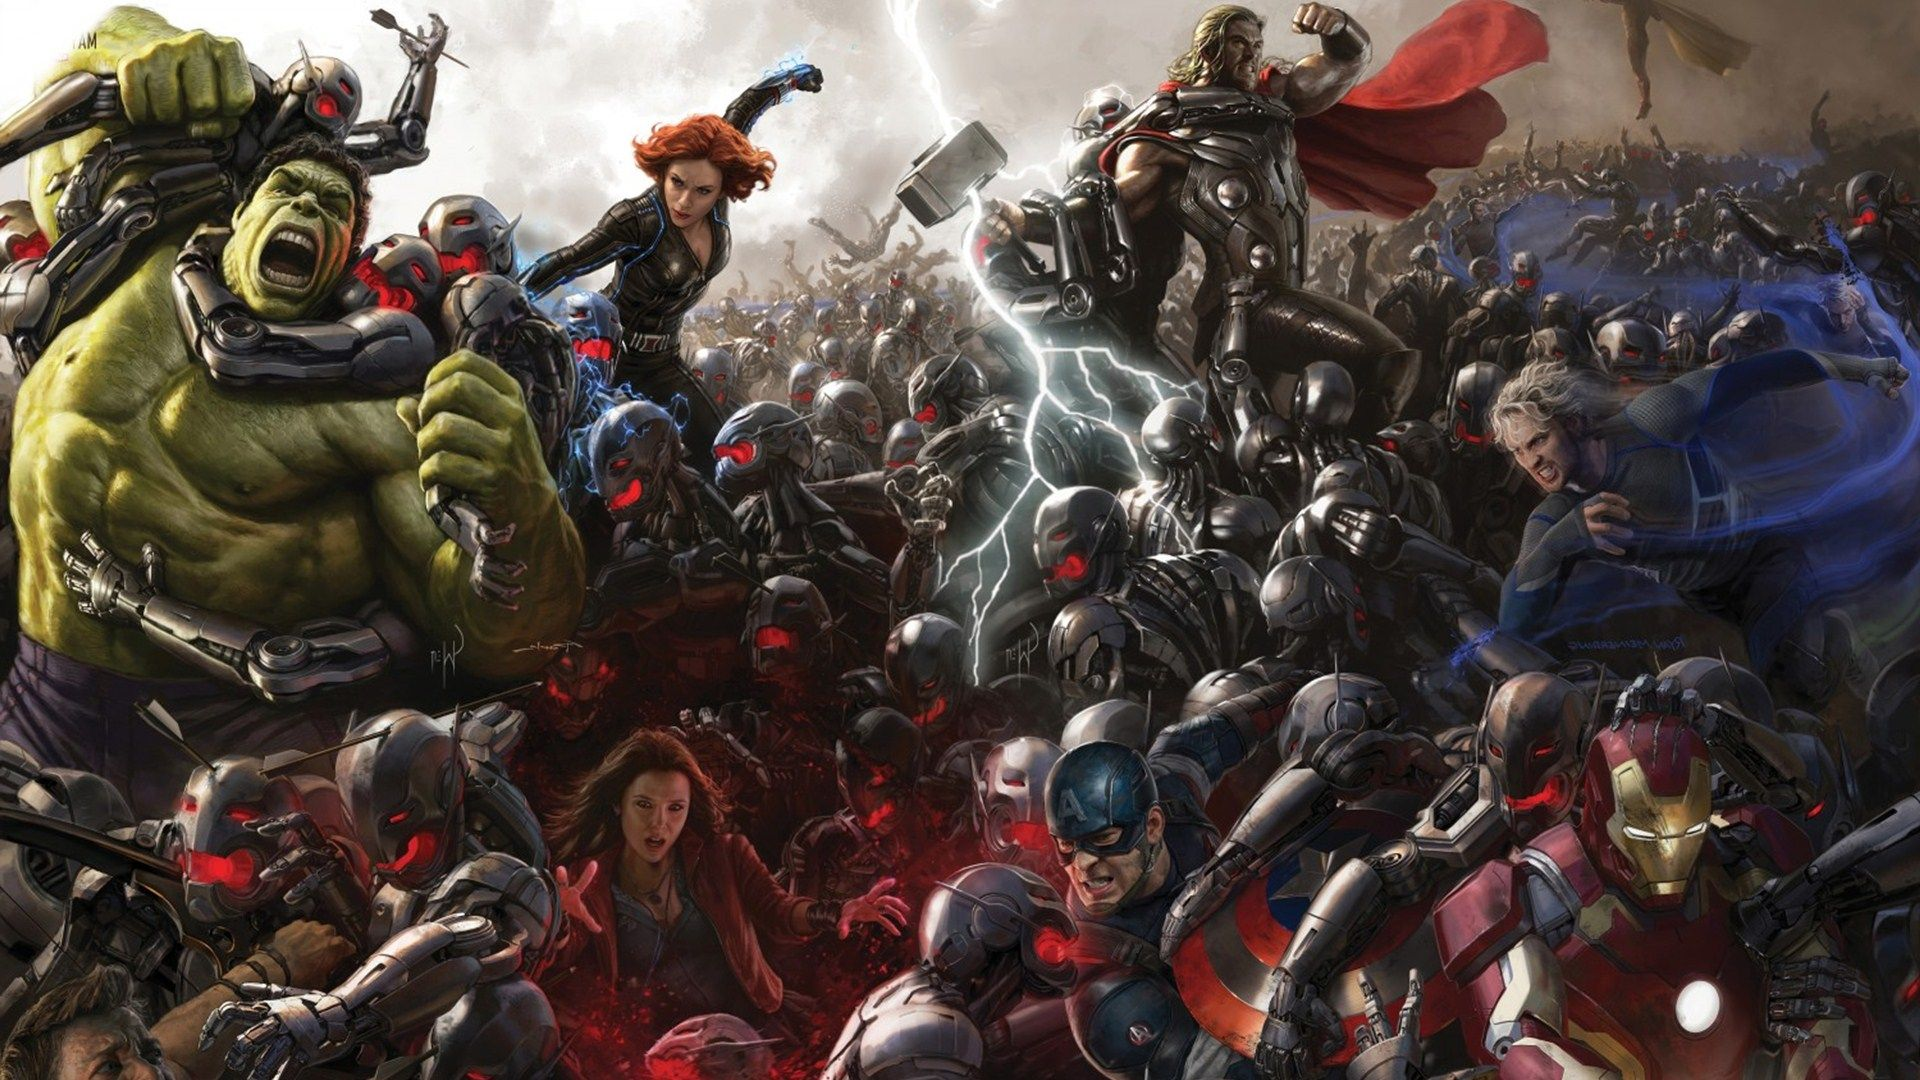 avengers marvel wallpaper 1920×1080 download hd wallpapers of